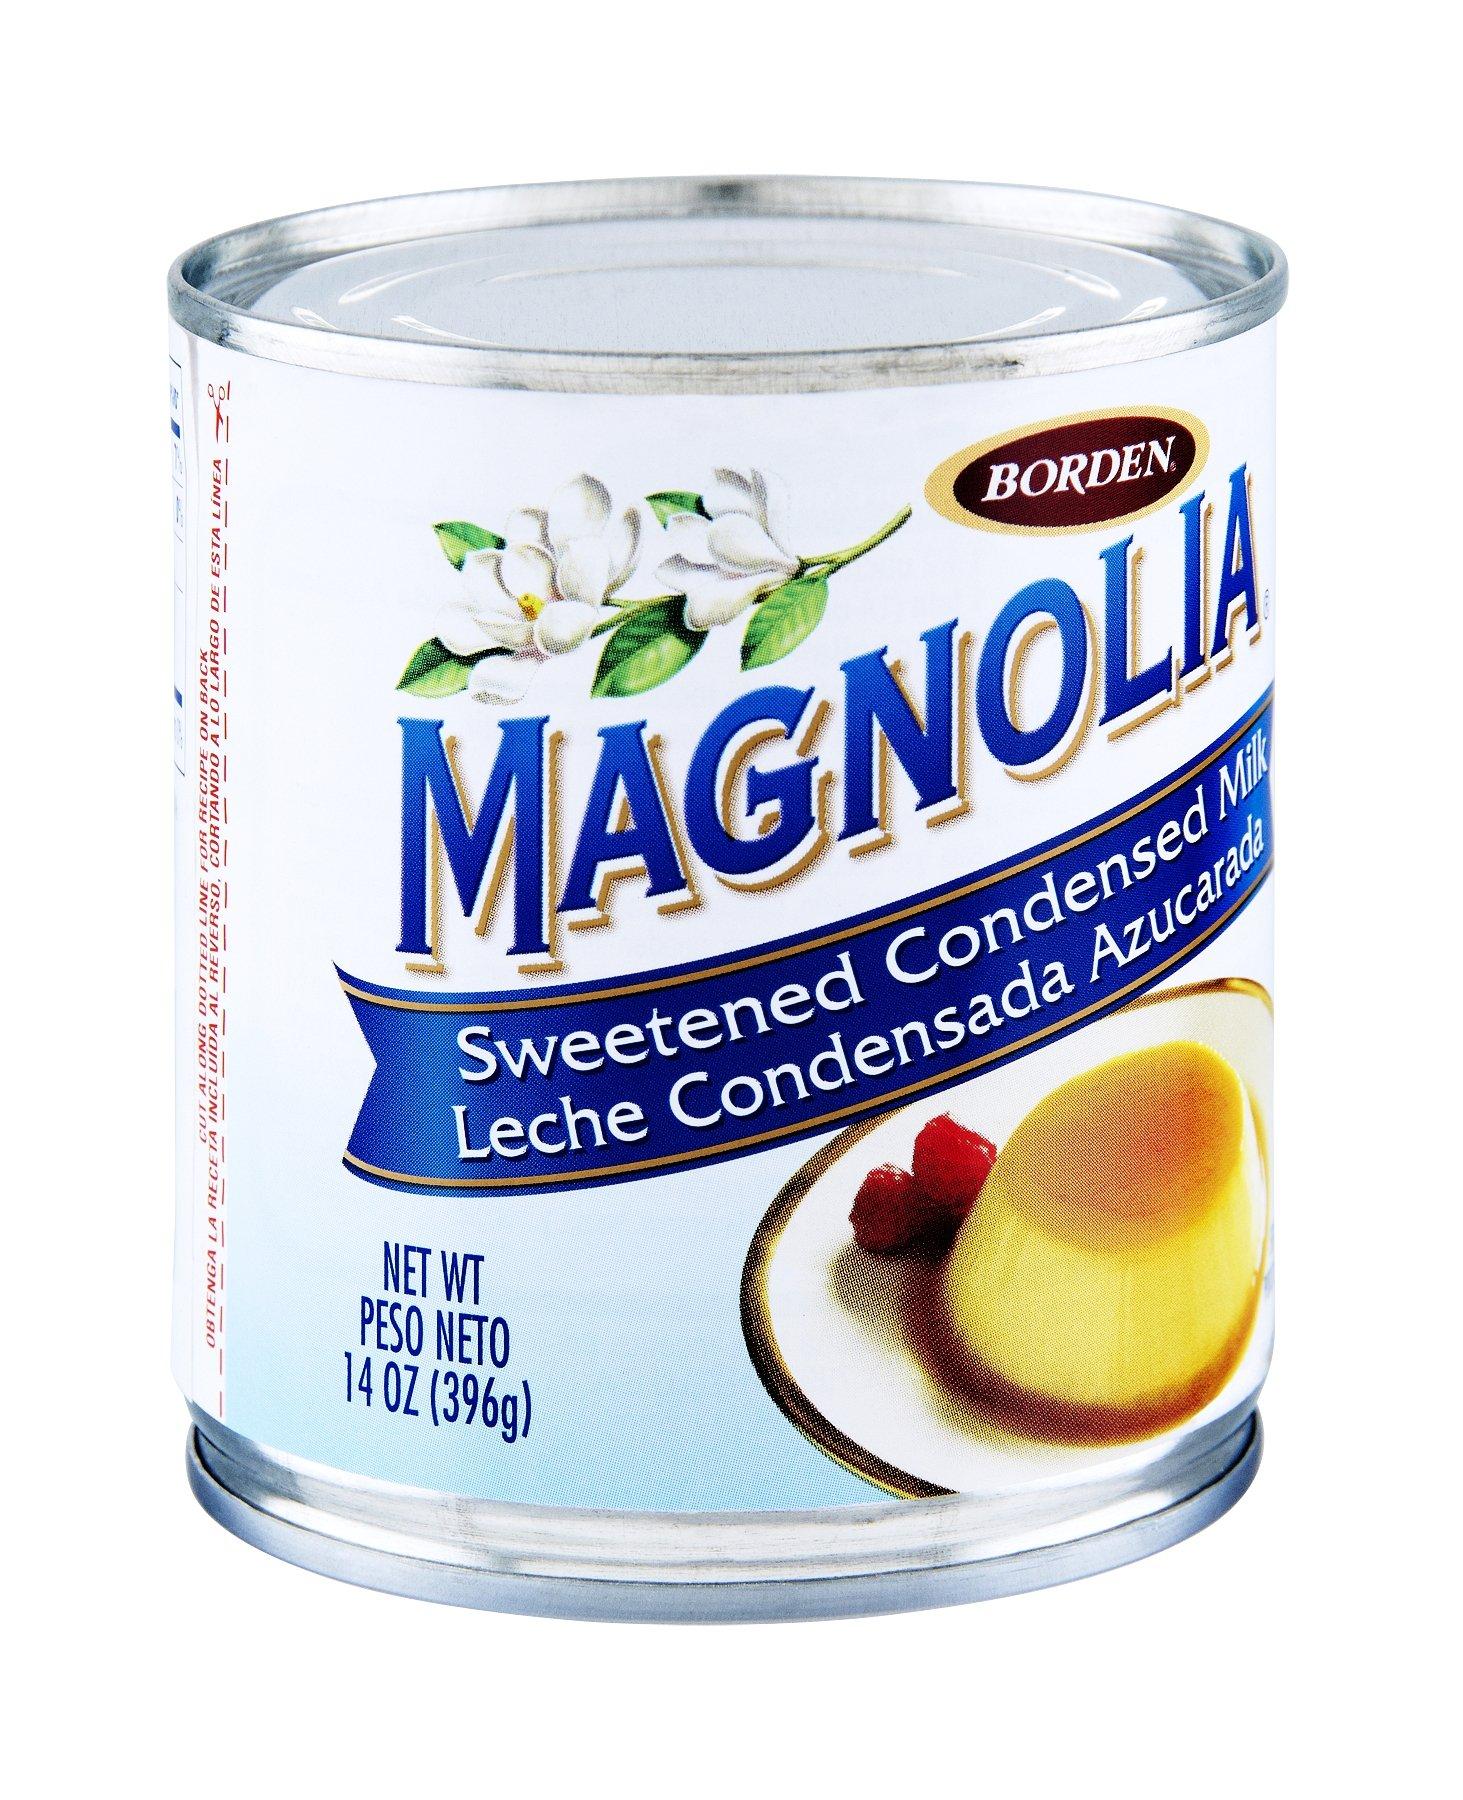 Borden, Magnolia, Sweetened Condensed Milk, 14oz Can (Pack of 6)